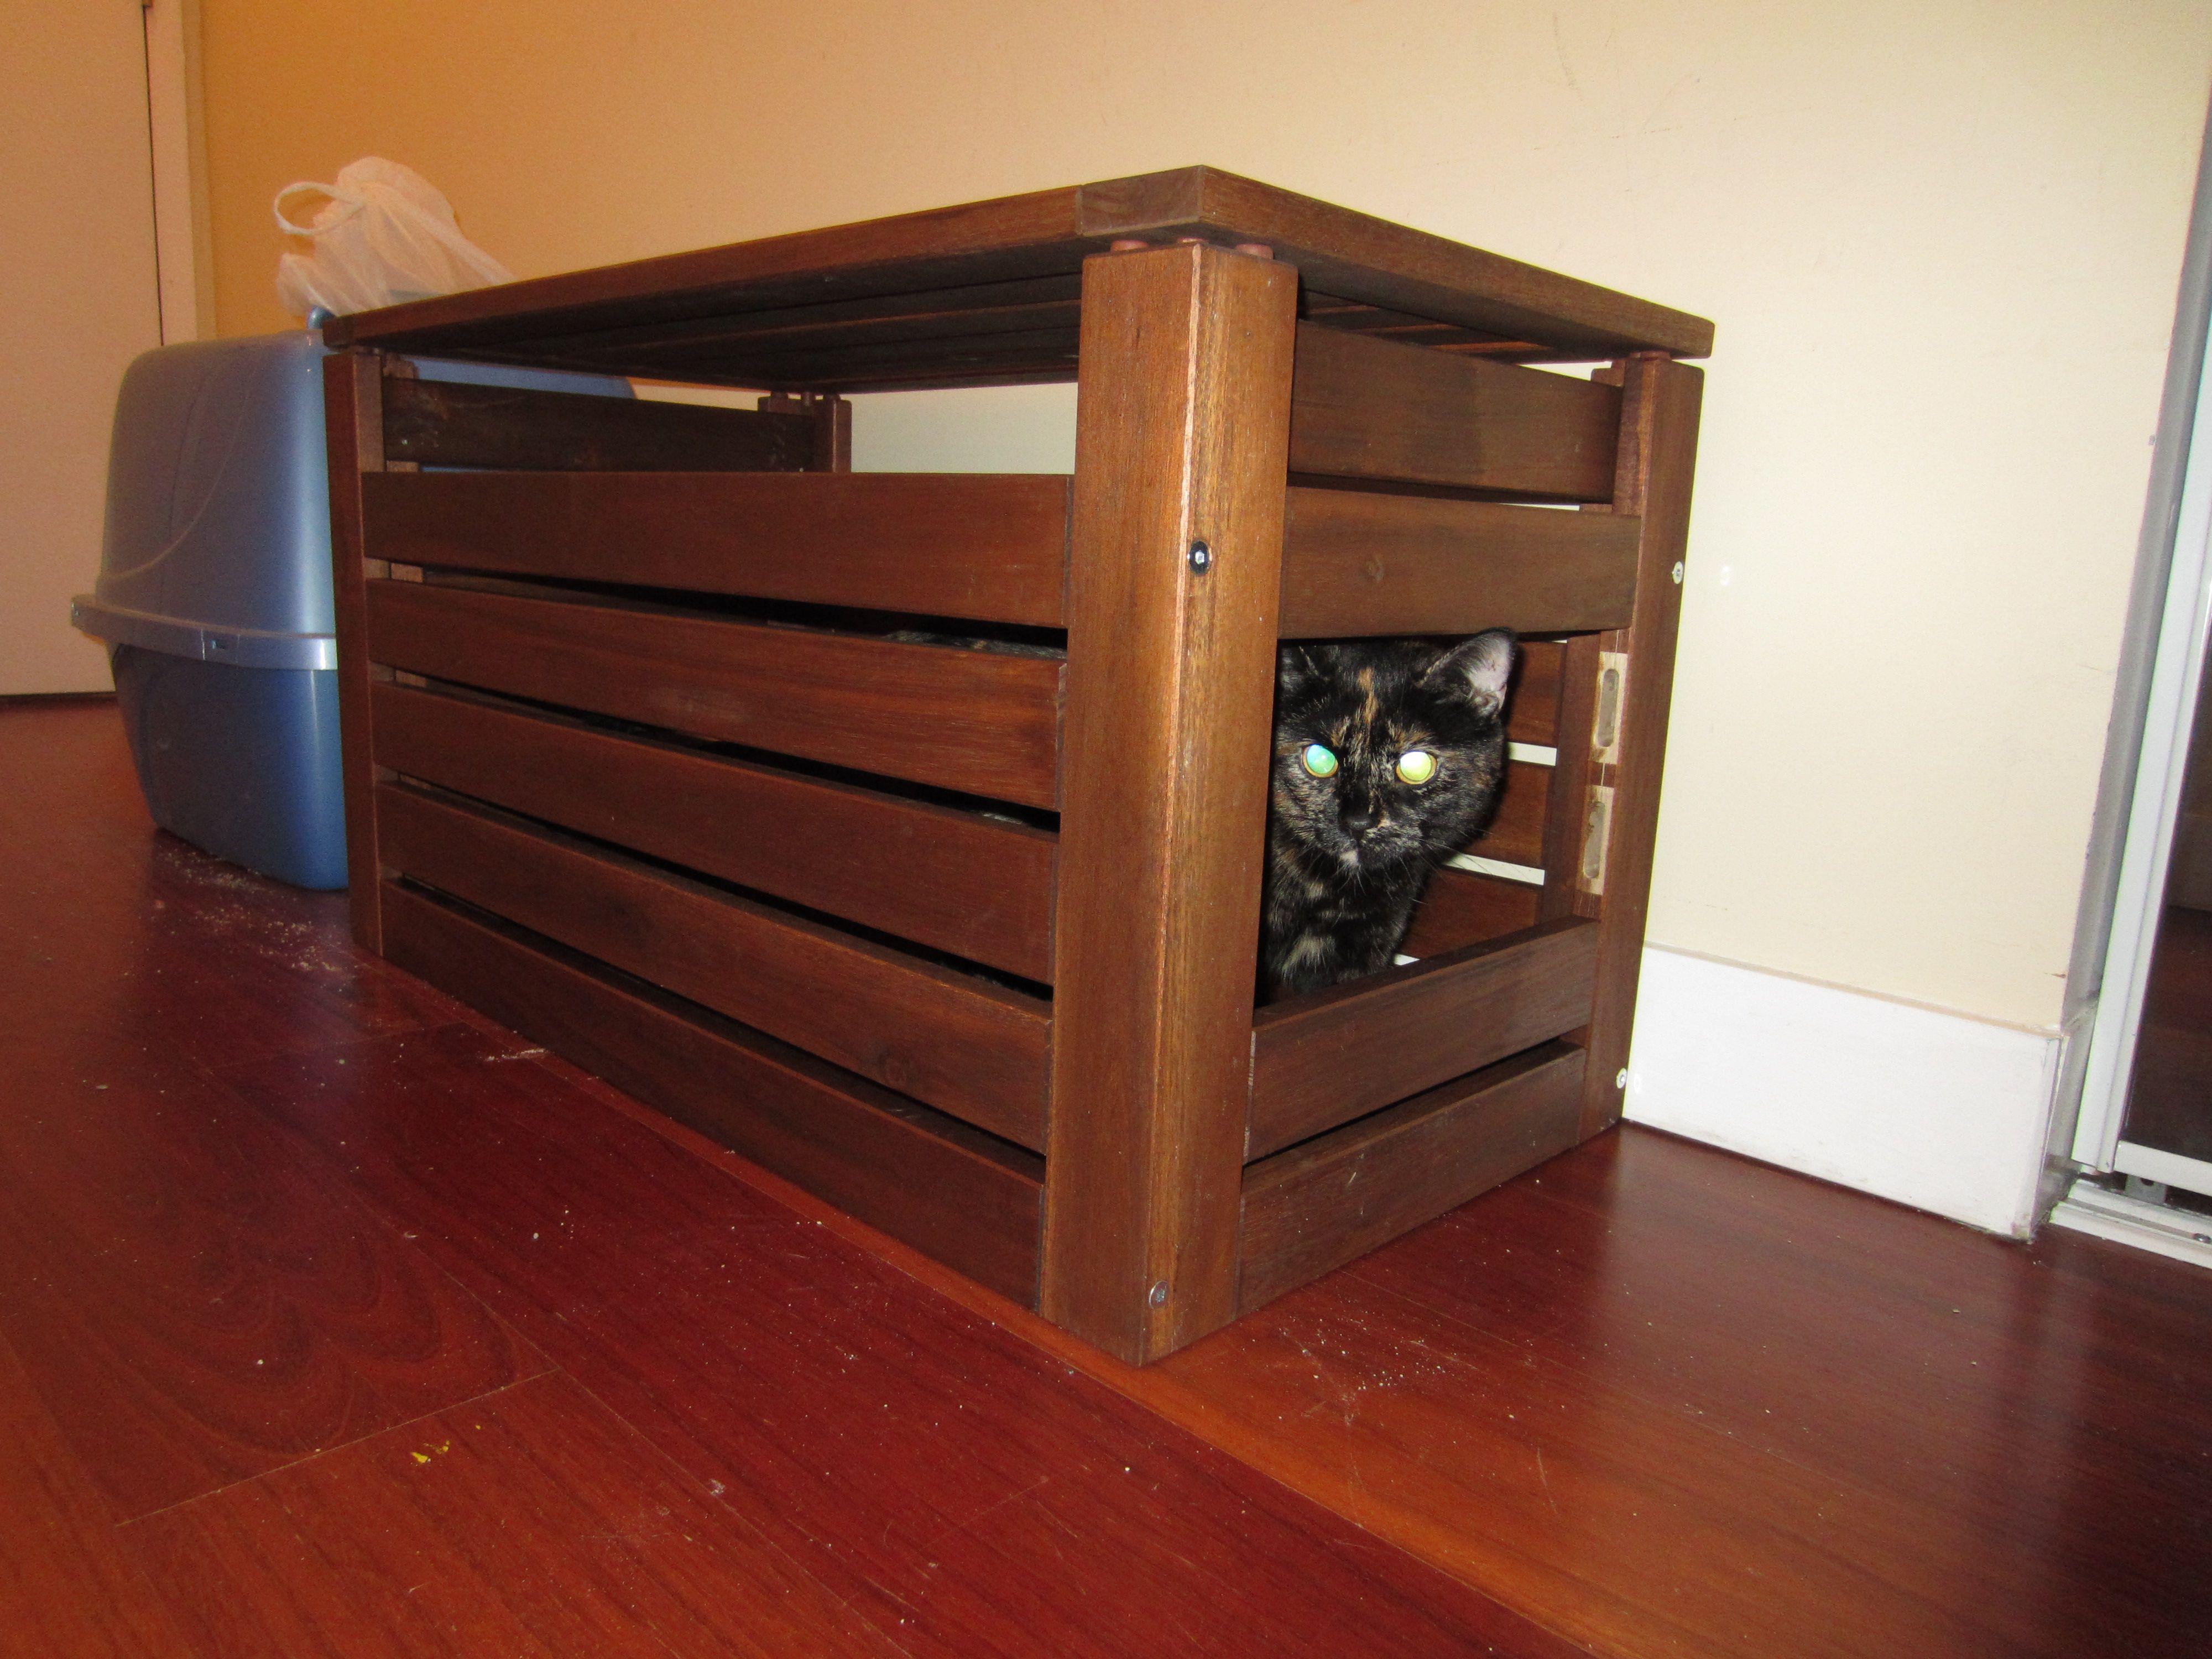 Best Diy Cat Litter Box Hide Away Using Ikea Applaro Storage Bench So Doing This At The New Place Cat Litter Tray Cat Litter Box Litter Box